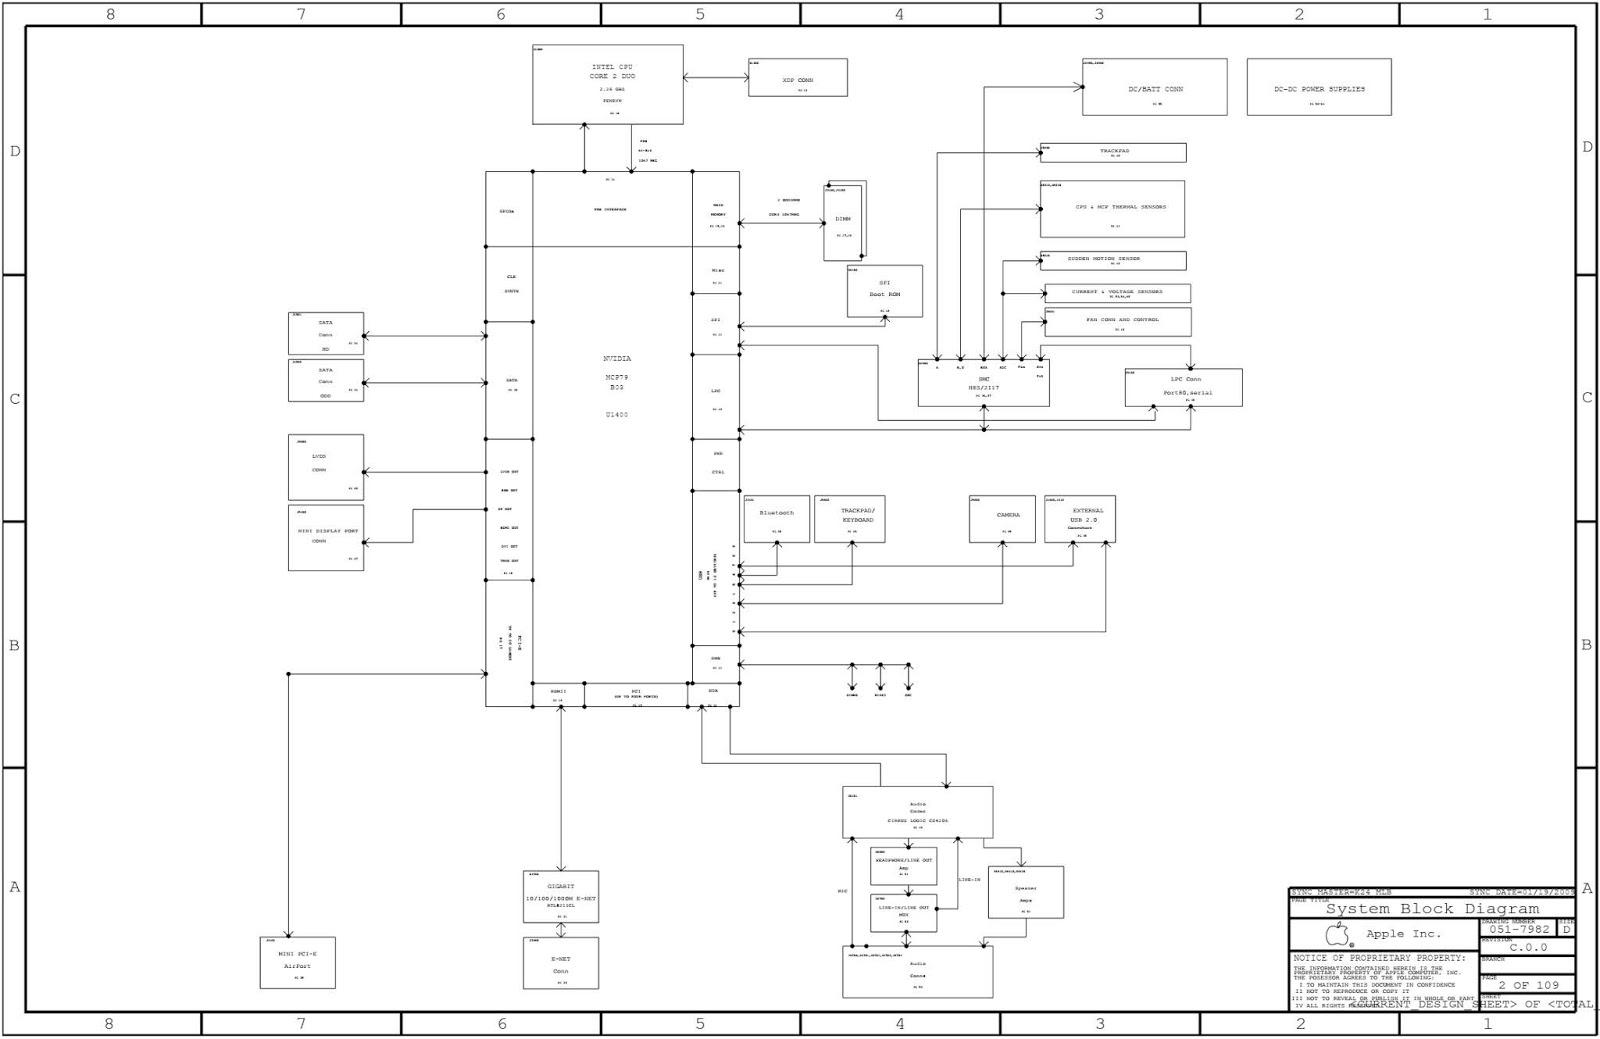 schematic apple macbook unibody a1342 - k84, 820-2567